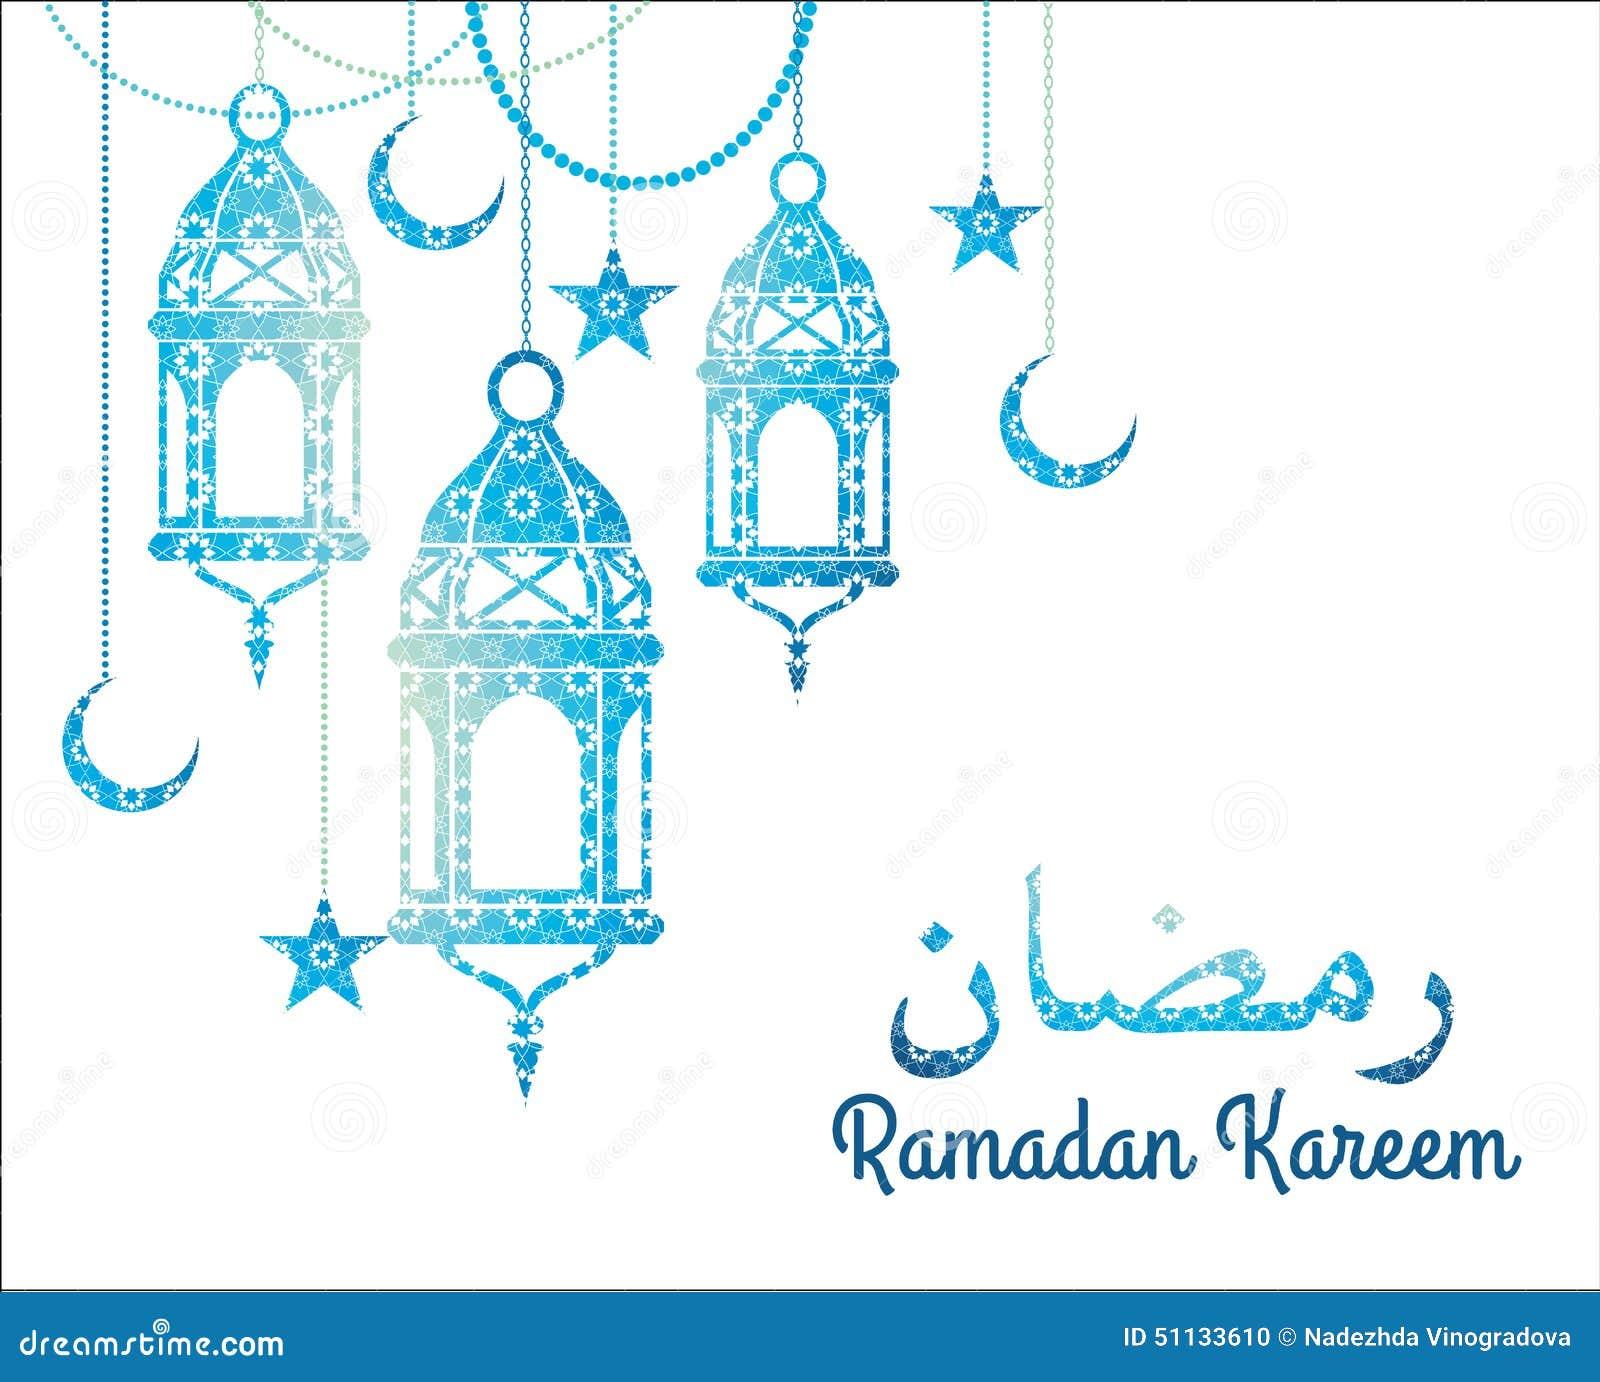 Ramadan Kareem. Vector Illustration Stock Vector - Image: 51133610